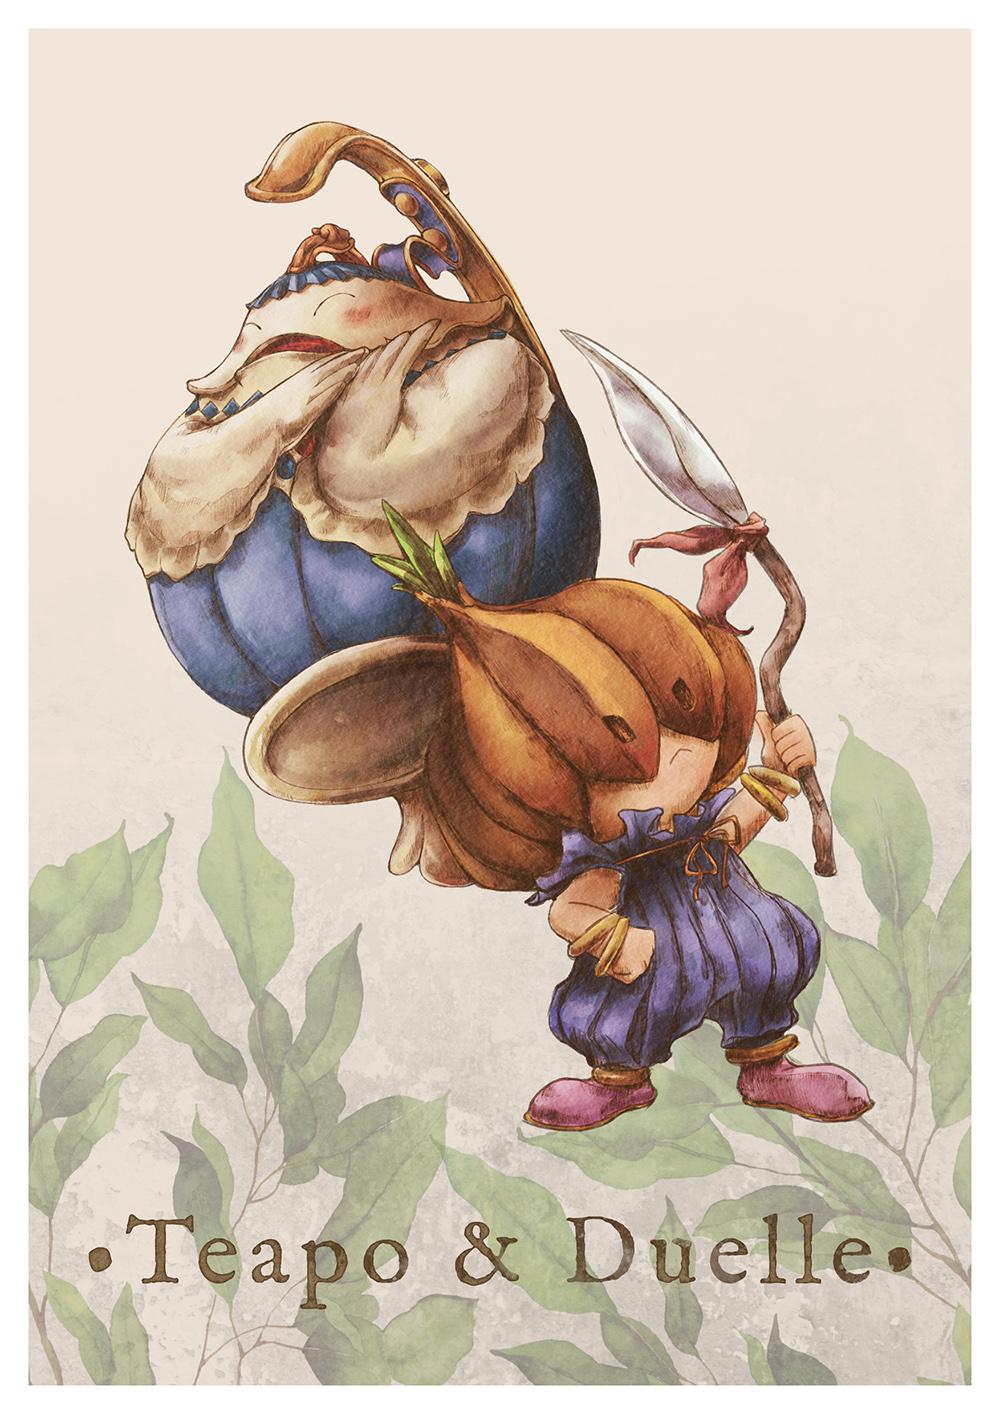 Paola Tuazon - 聖剣伝説 Seiken Densetsu: Legend of Mana - 瑠璃 Teapo Duelle Onion Knight Character NPC Fanart PS1 JRPG Game